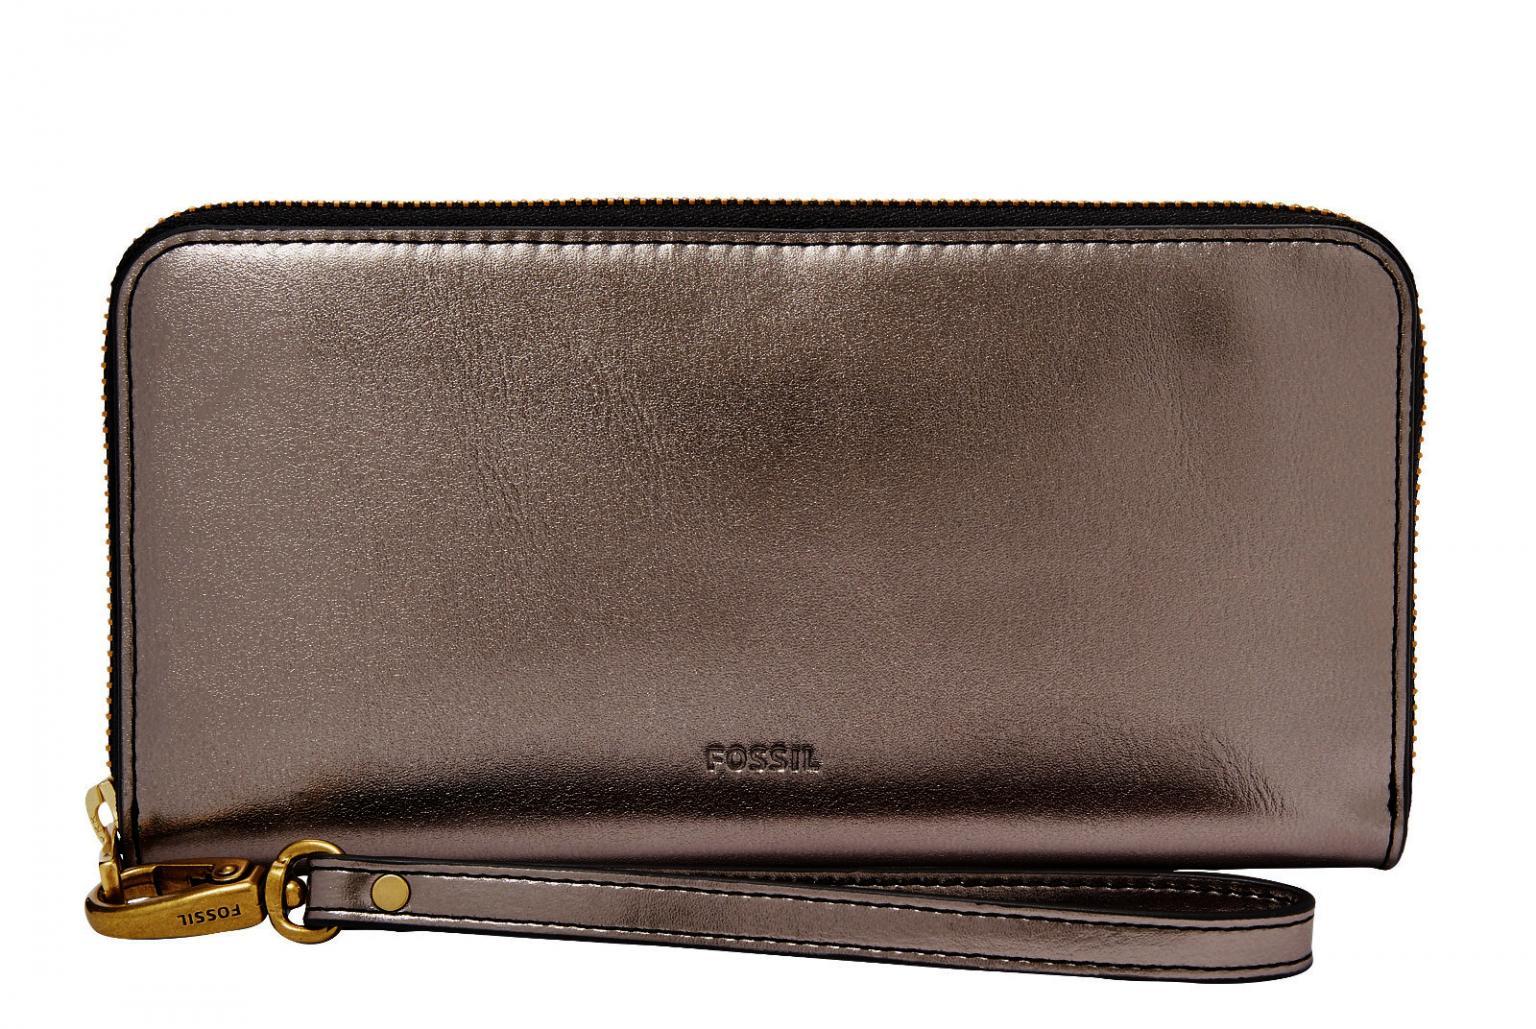 bb01ffb7f5489 Fossil Emma Large RFID Protection Geldbörse anthrazit silber - Bags ...